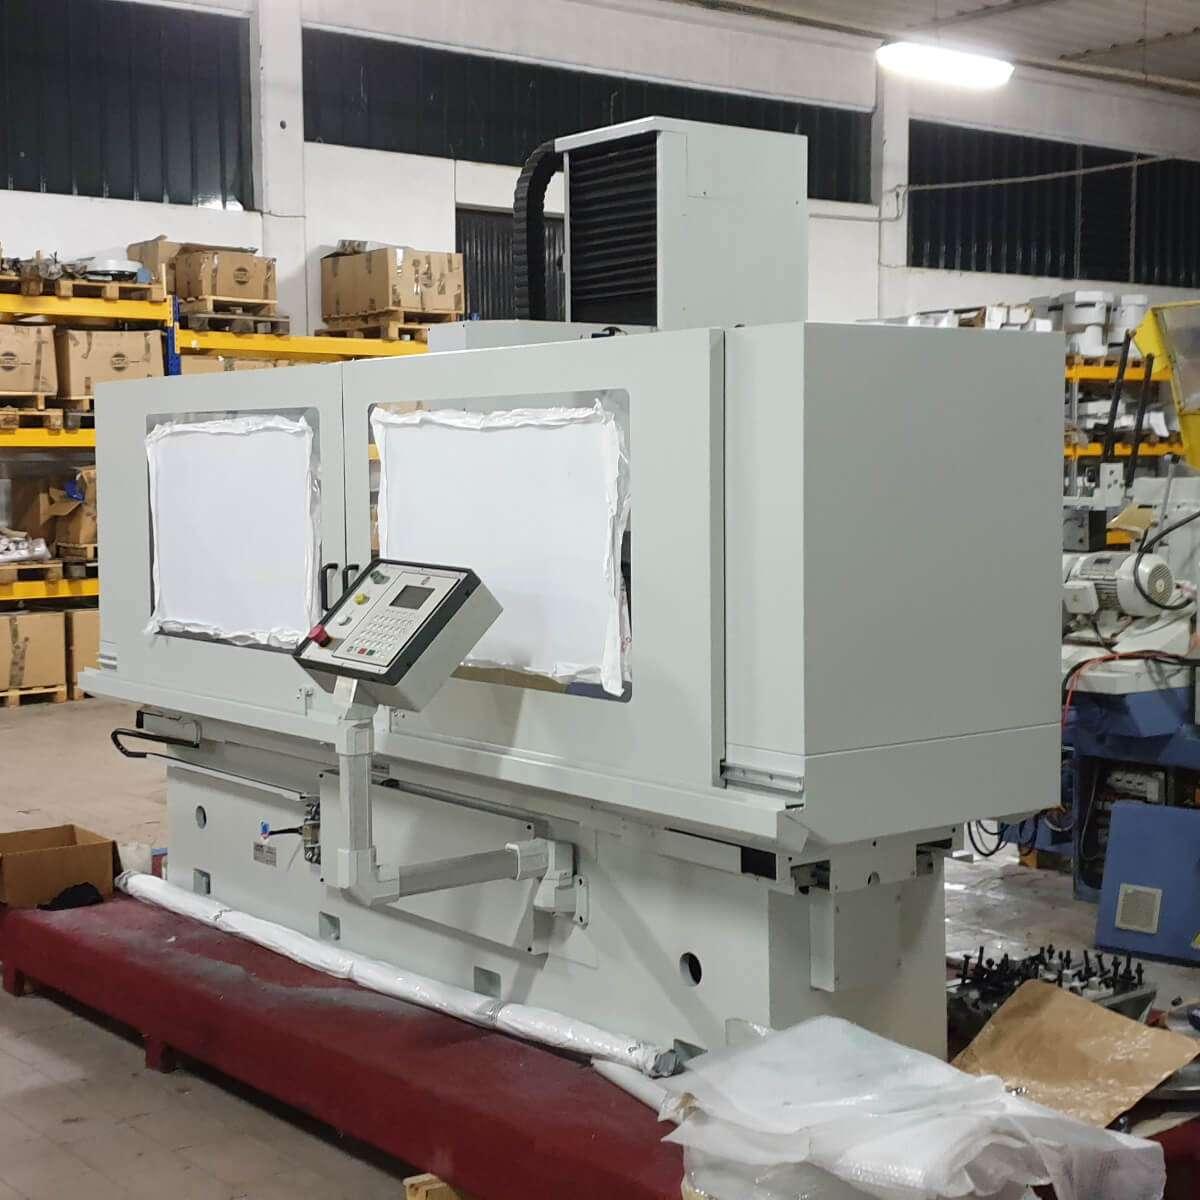 MU400 - BERCO SMG2000 spianatrice testate